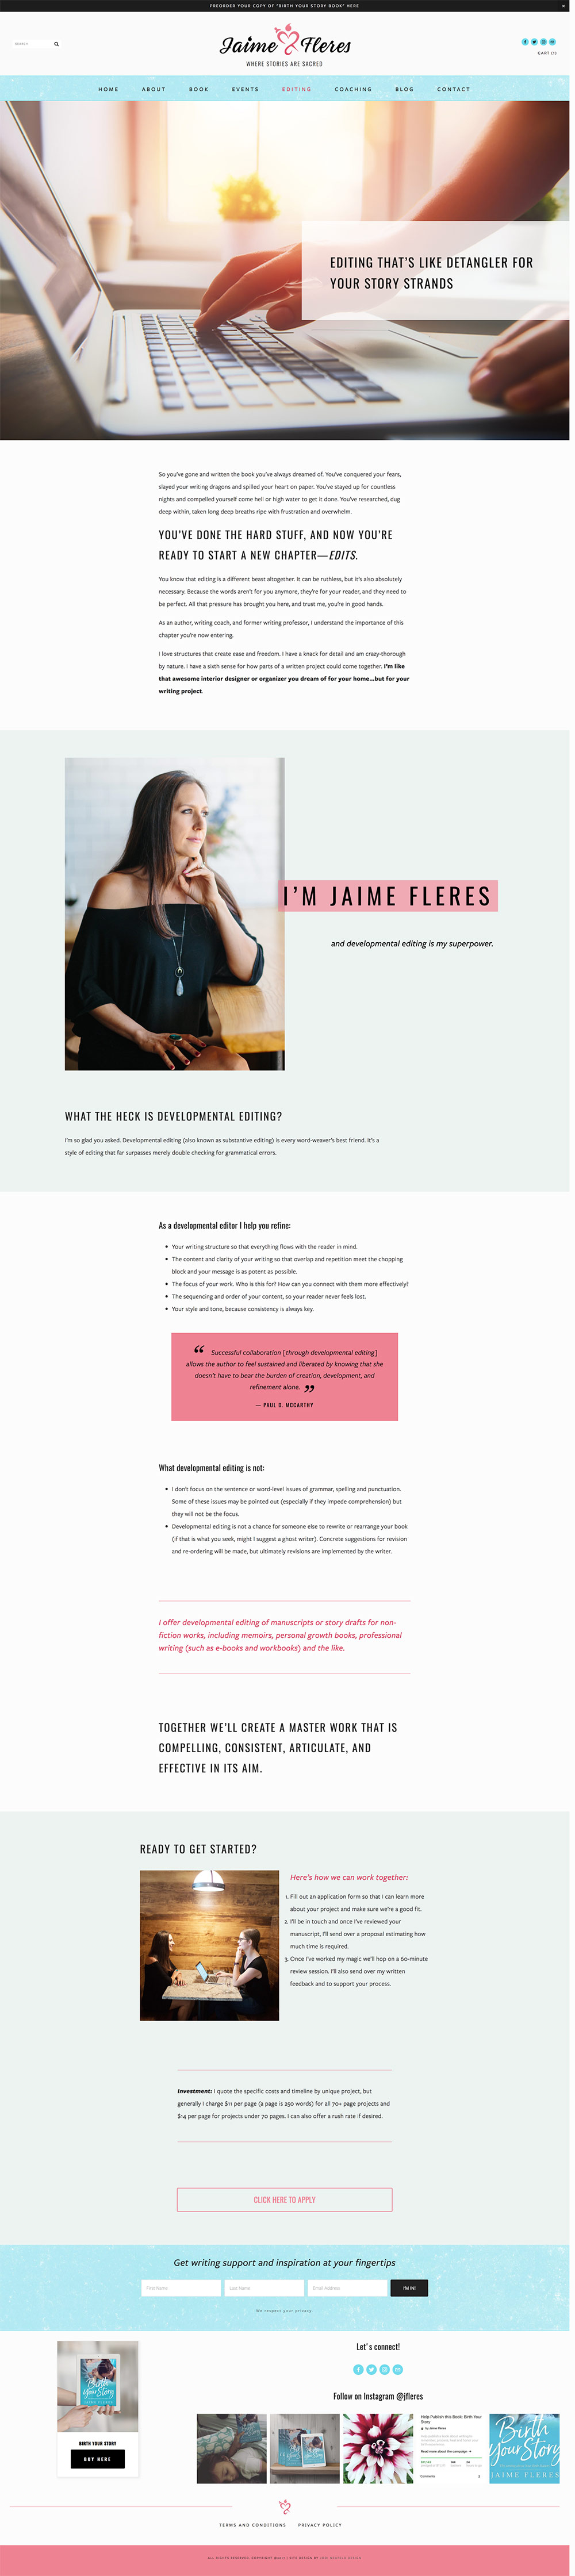 editing page.jpg